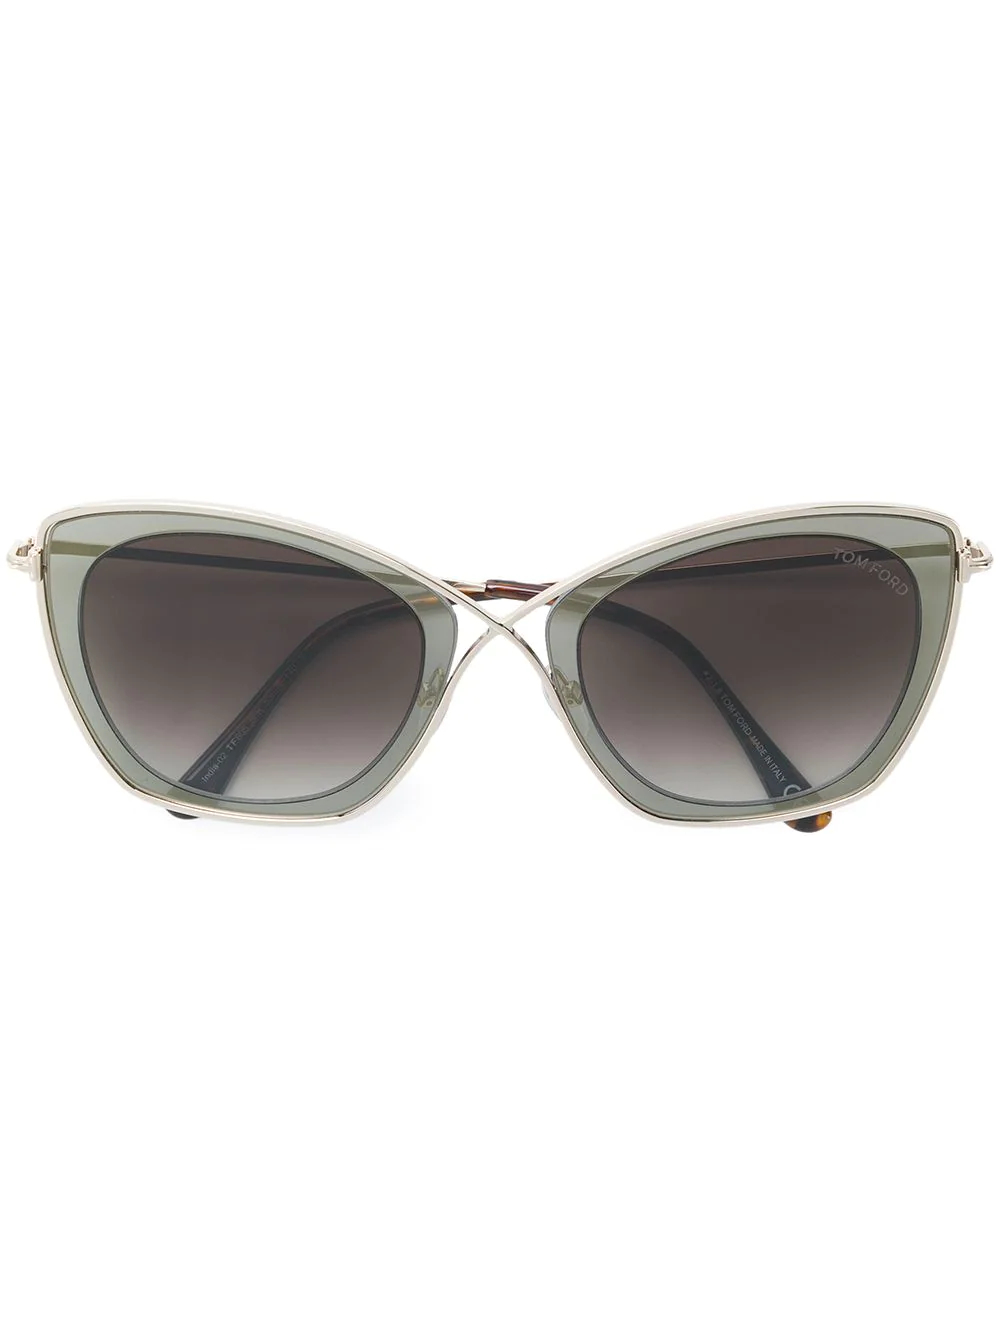 Tom Ford | солнцезащитные очки формы 'кошачий глаз' | Clouty